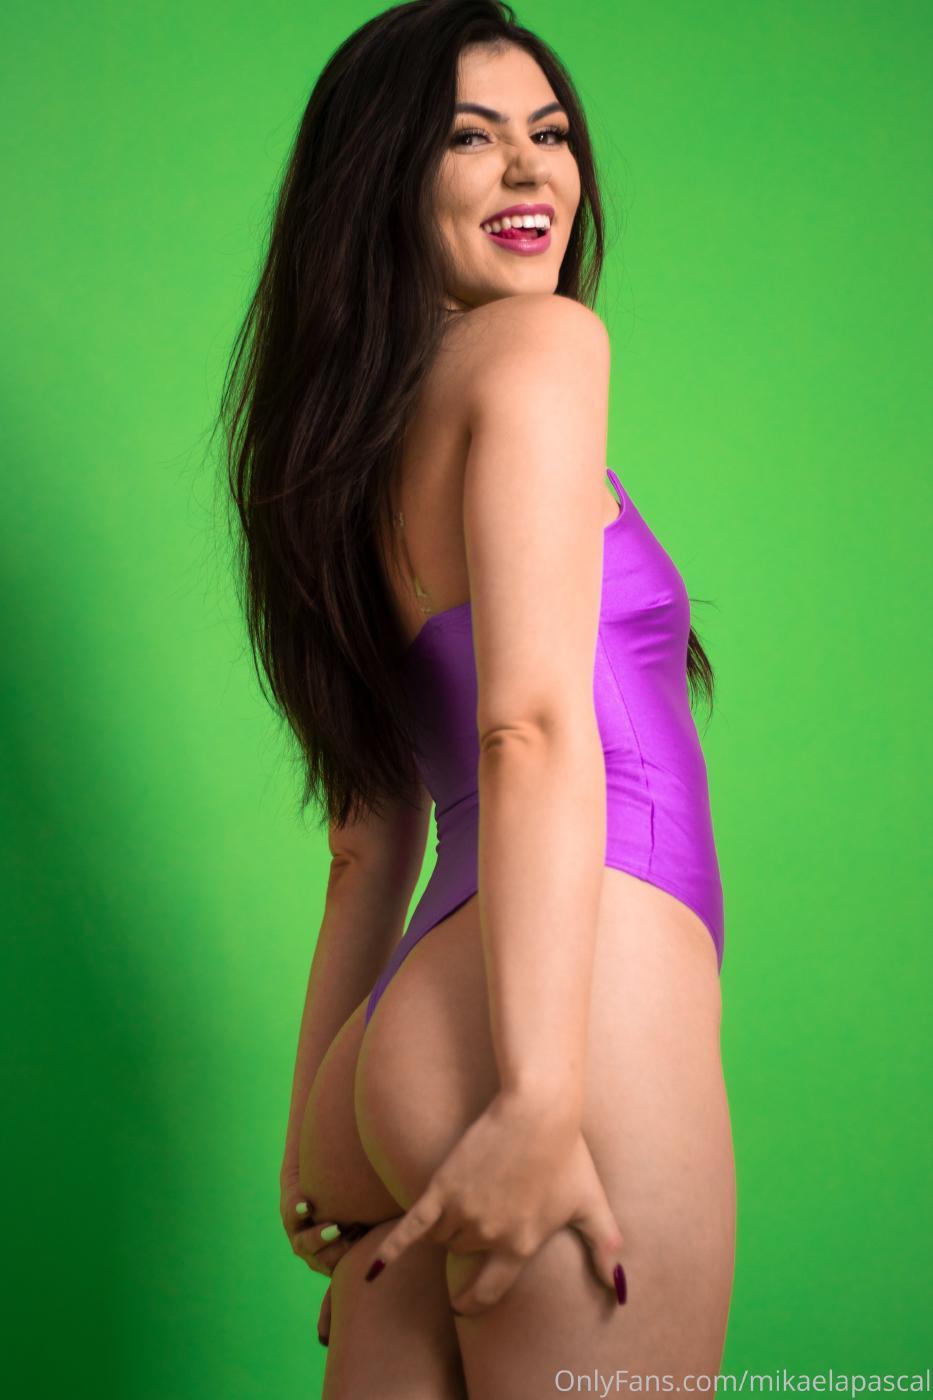 Mikaela Pascal Purple Lingerie Onlyfans Set Leaked 0005